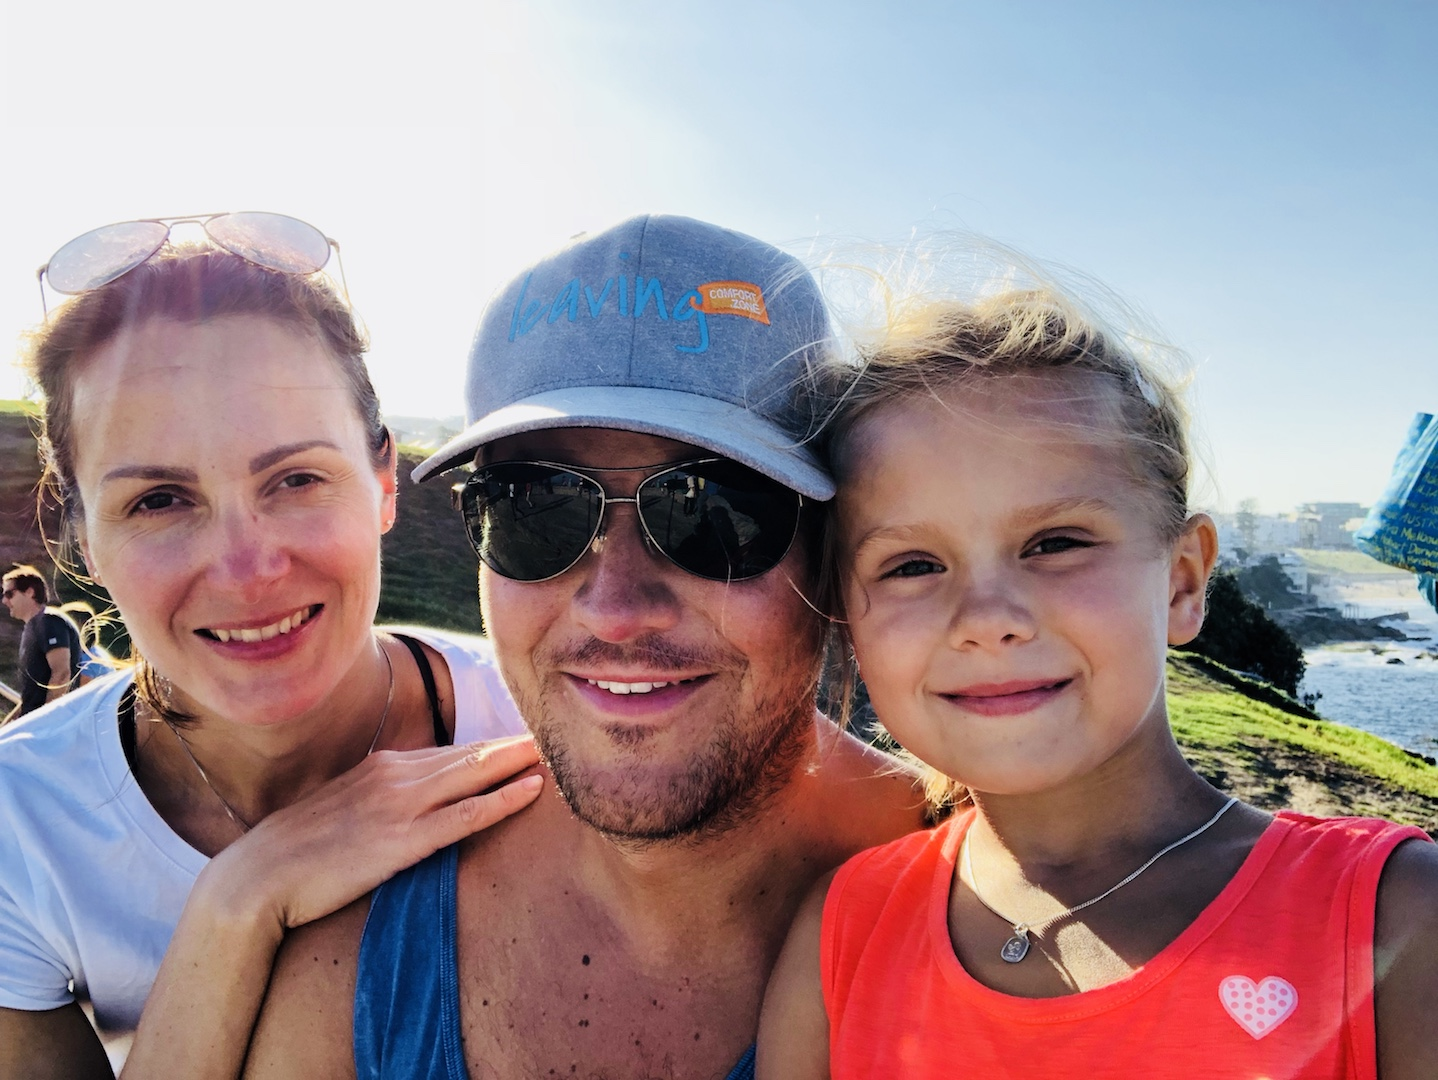 Familie auf dem Coastal Walk, Sydney